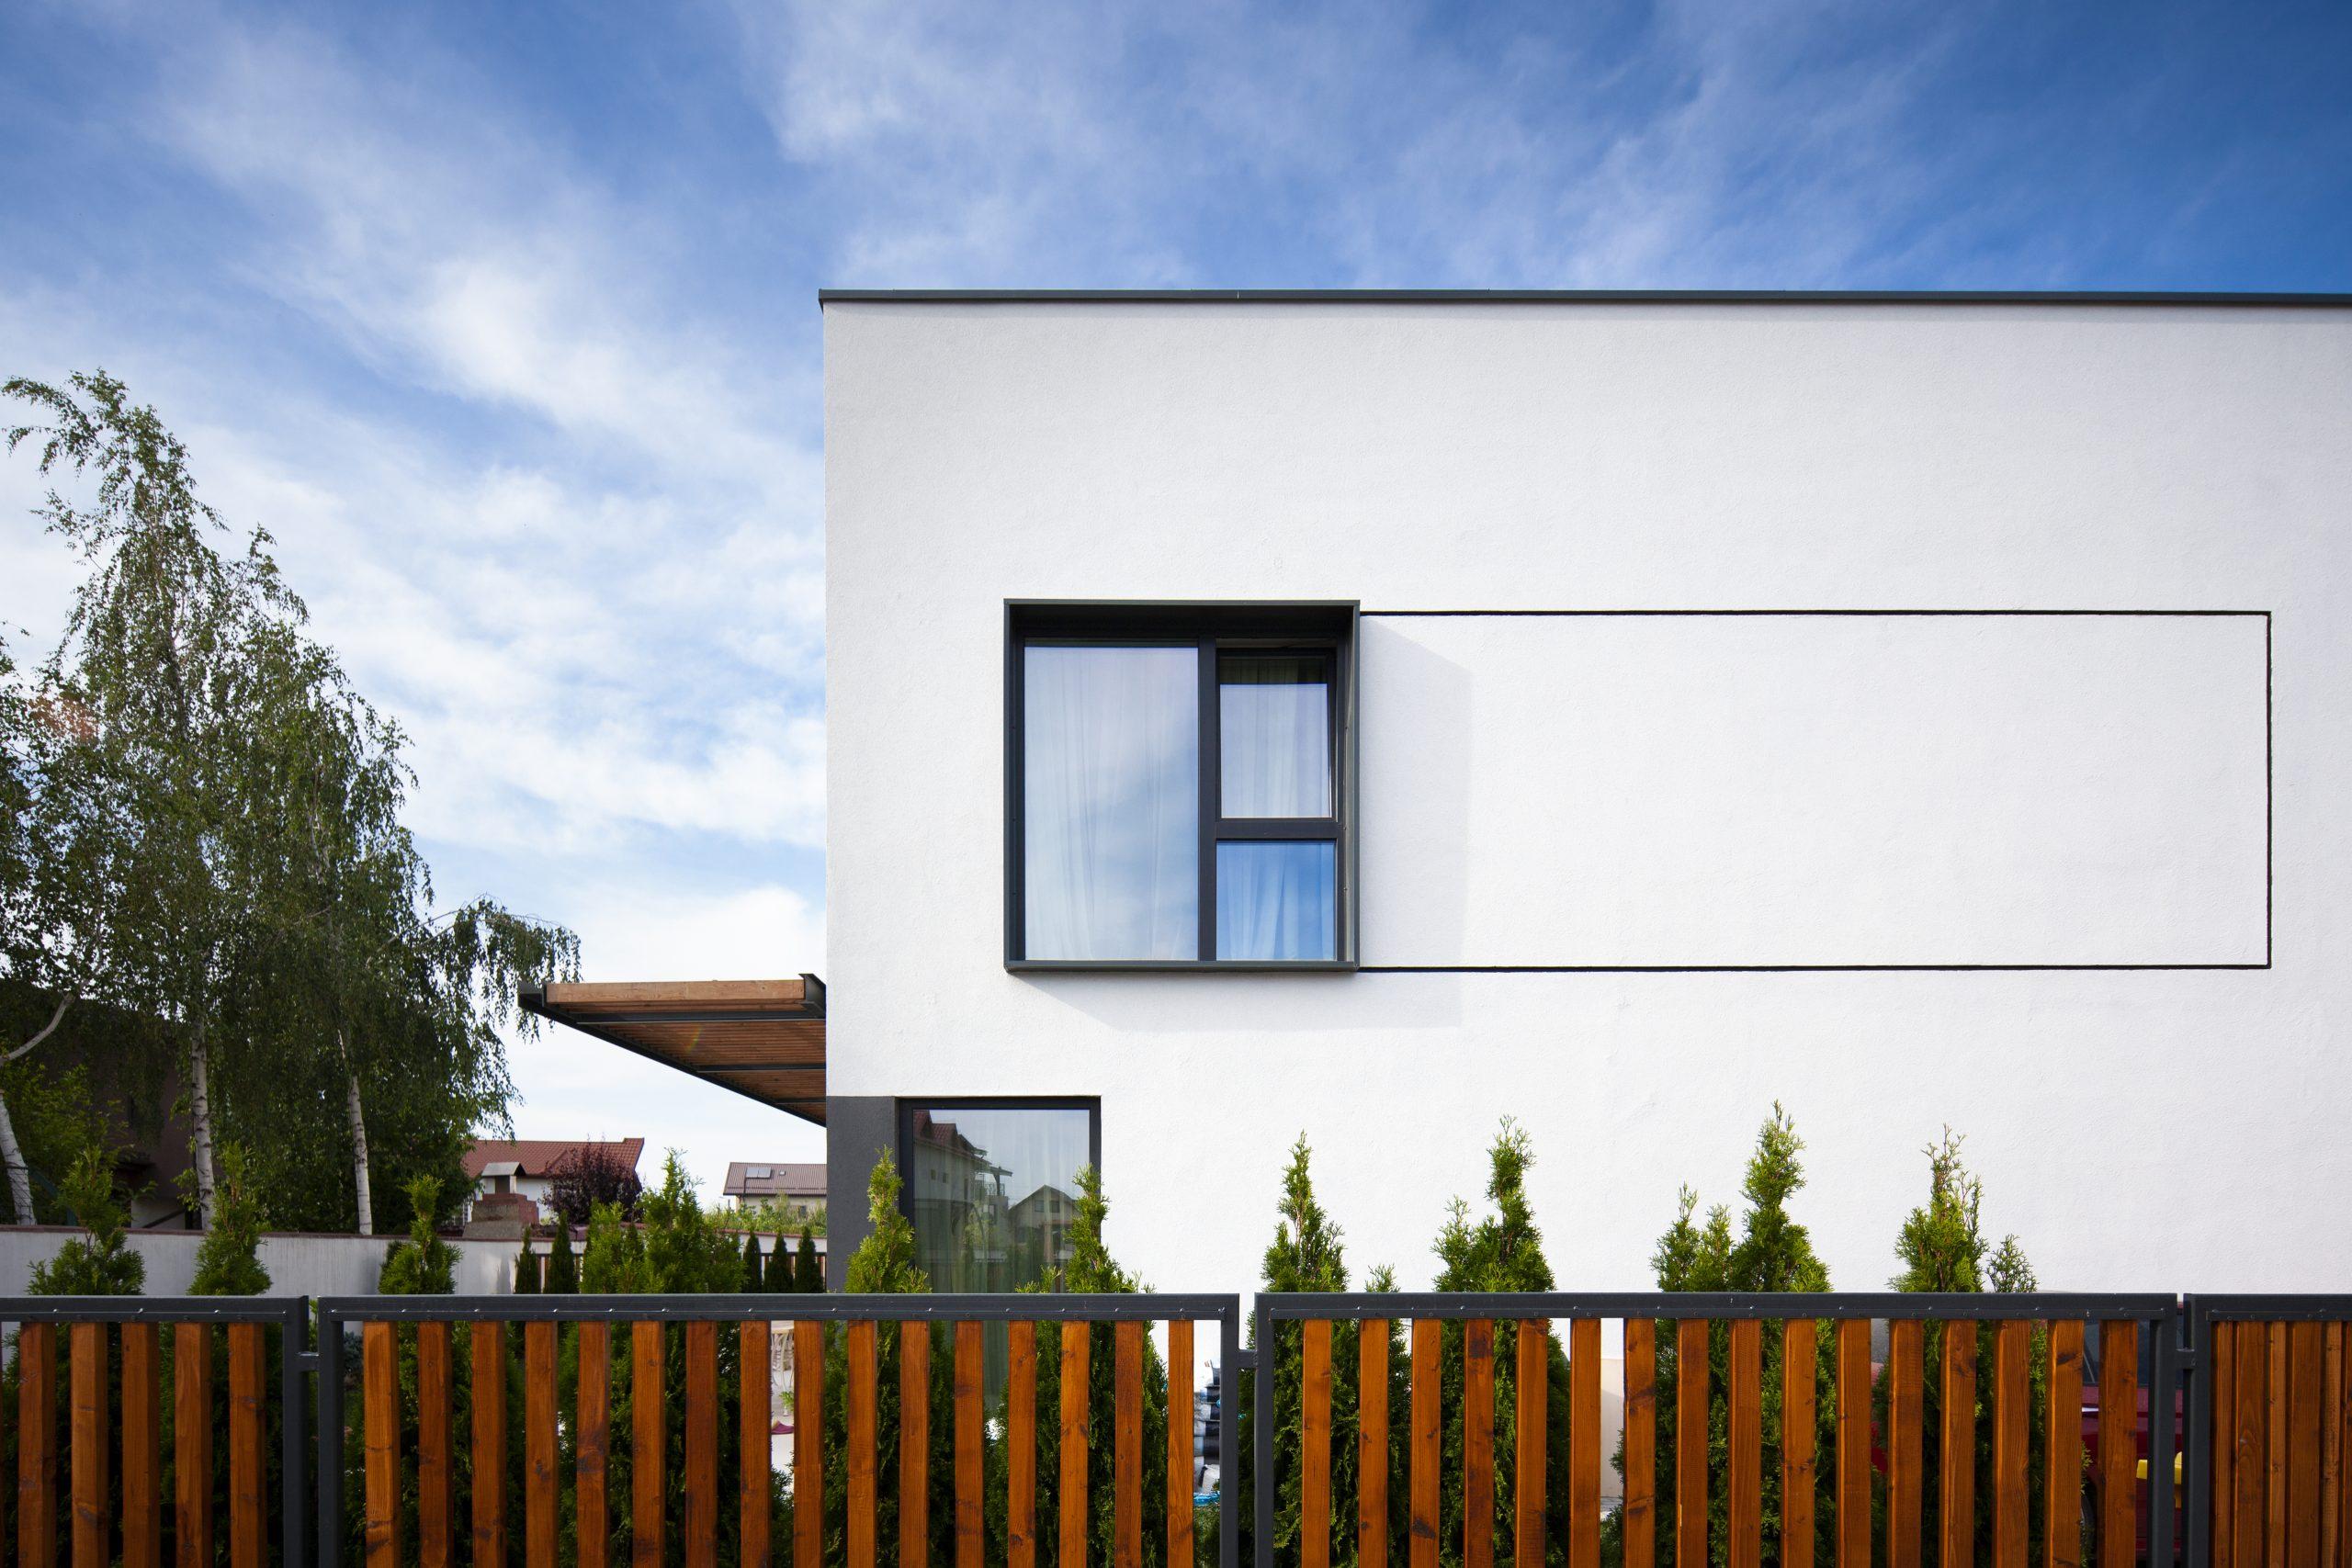 https://nbc-arhitect.ro/wp-content/uploads/2020/10/NBC-Arhitect-_-residentials-_-Contemporan-Residence-_-Bucharest-Romania_16-1-scaled.jpg